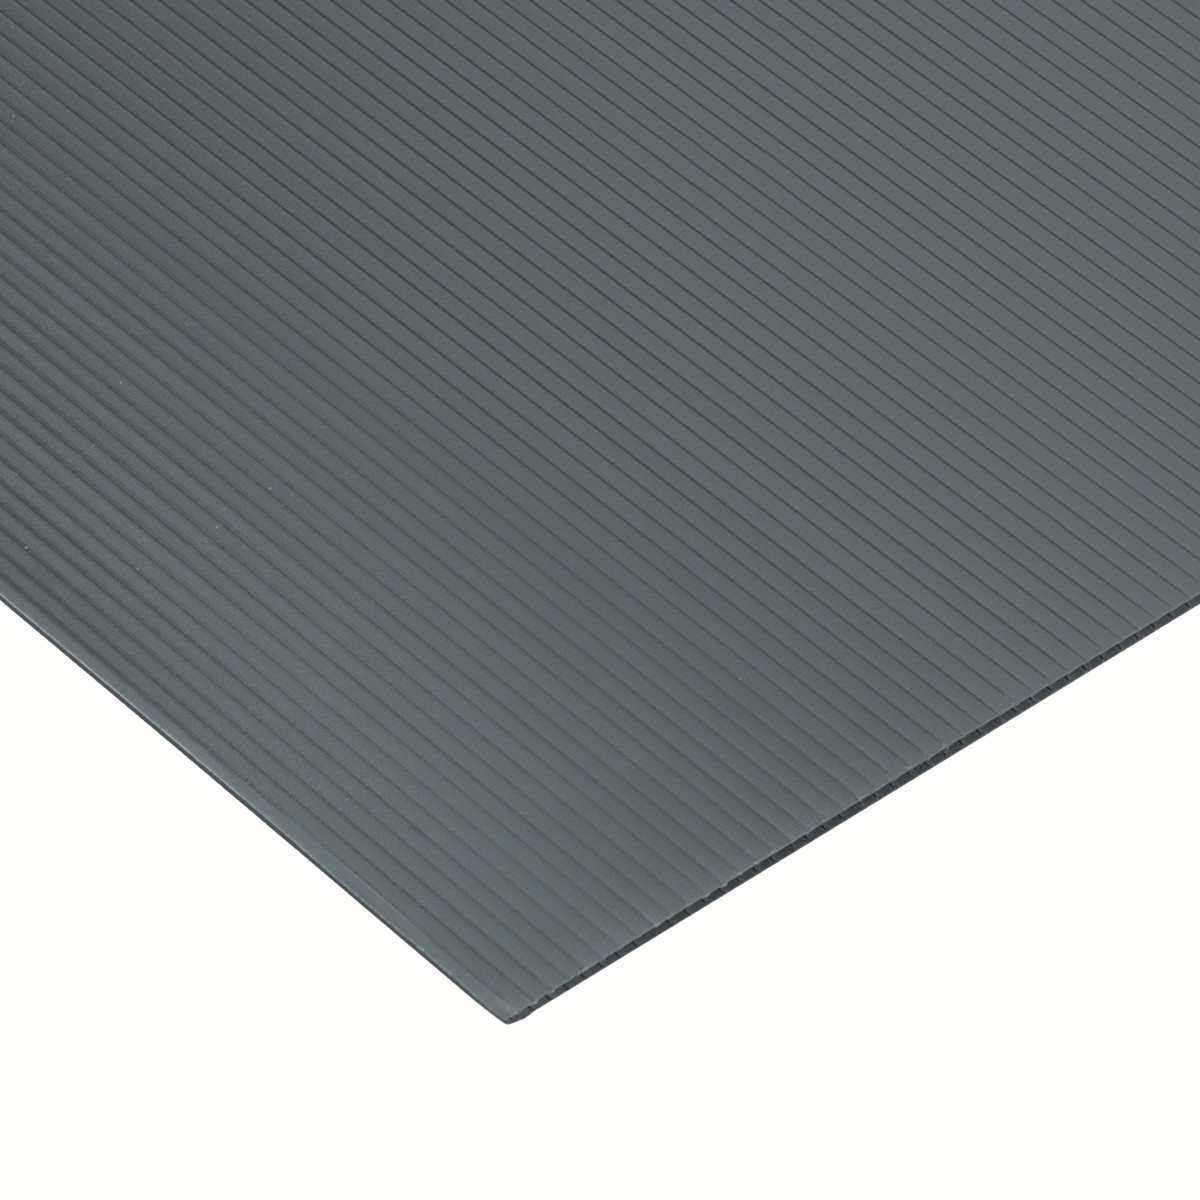 Lastra polionda grigio 1000 x 1000 mm prezzi e offerte online - Leroy merlin 94 ...